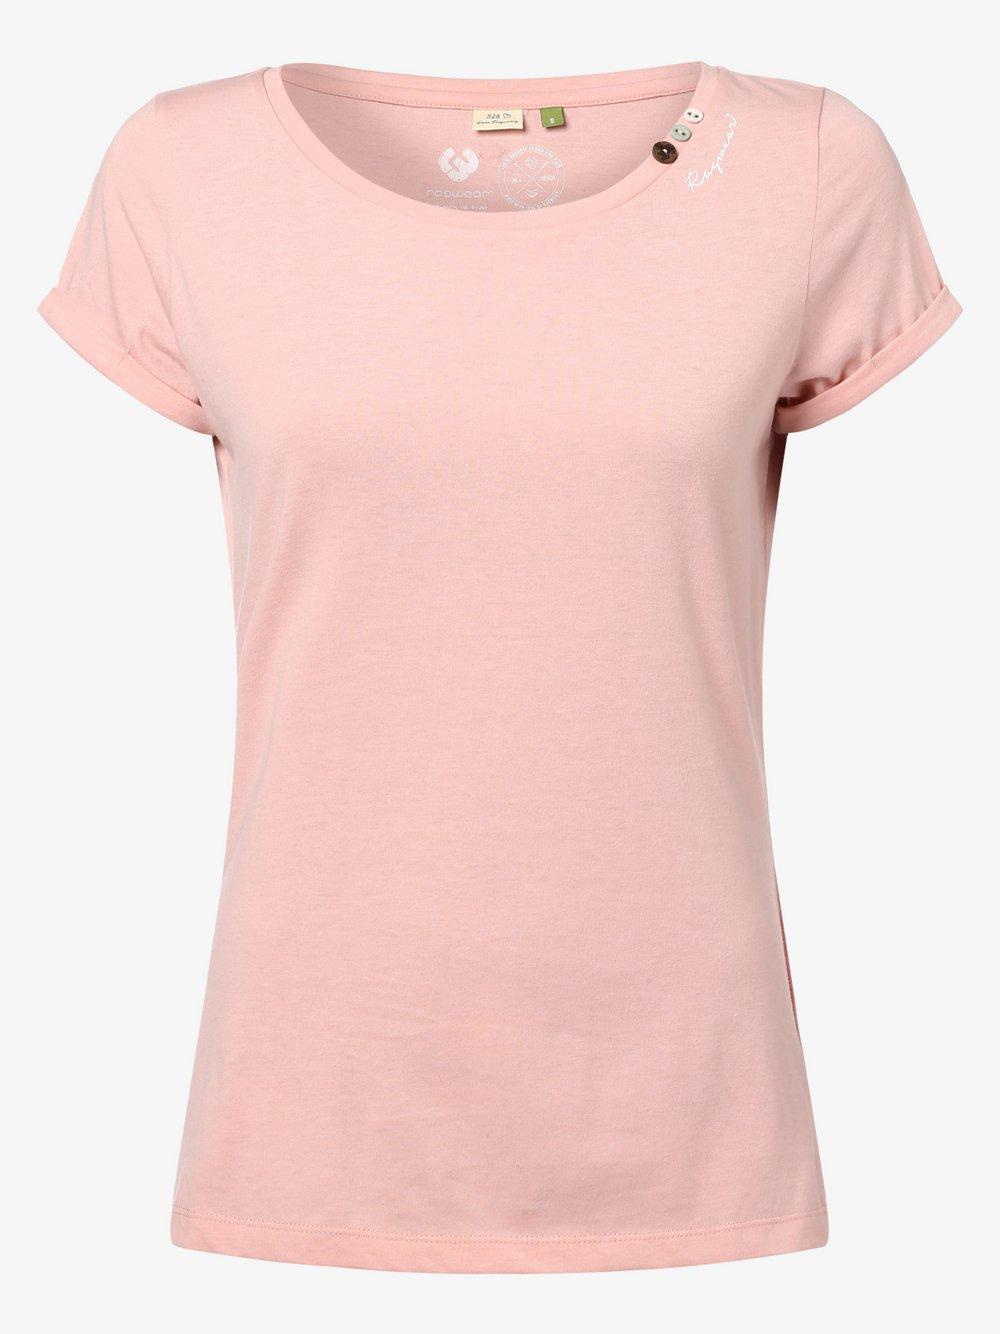 Ragwear - T-shirt damski – Florahh, różowy